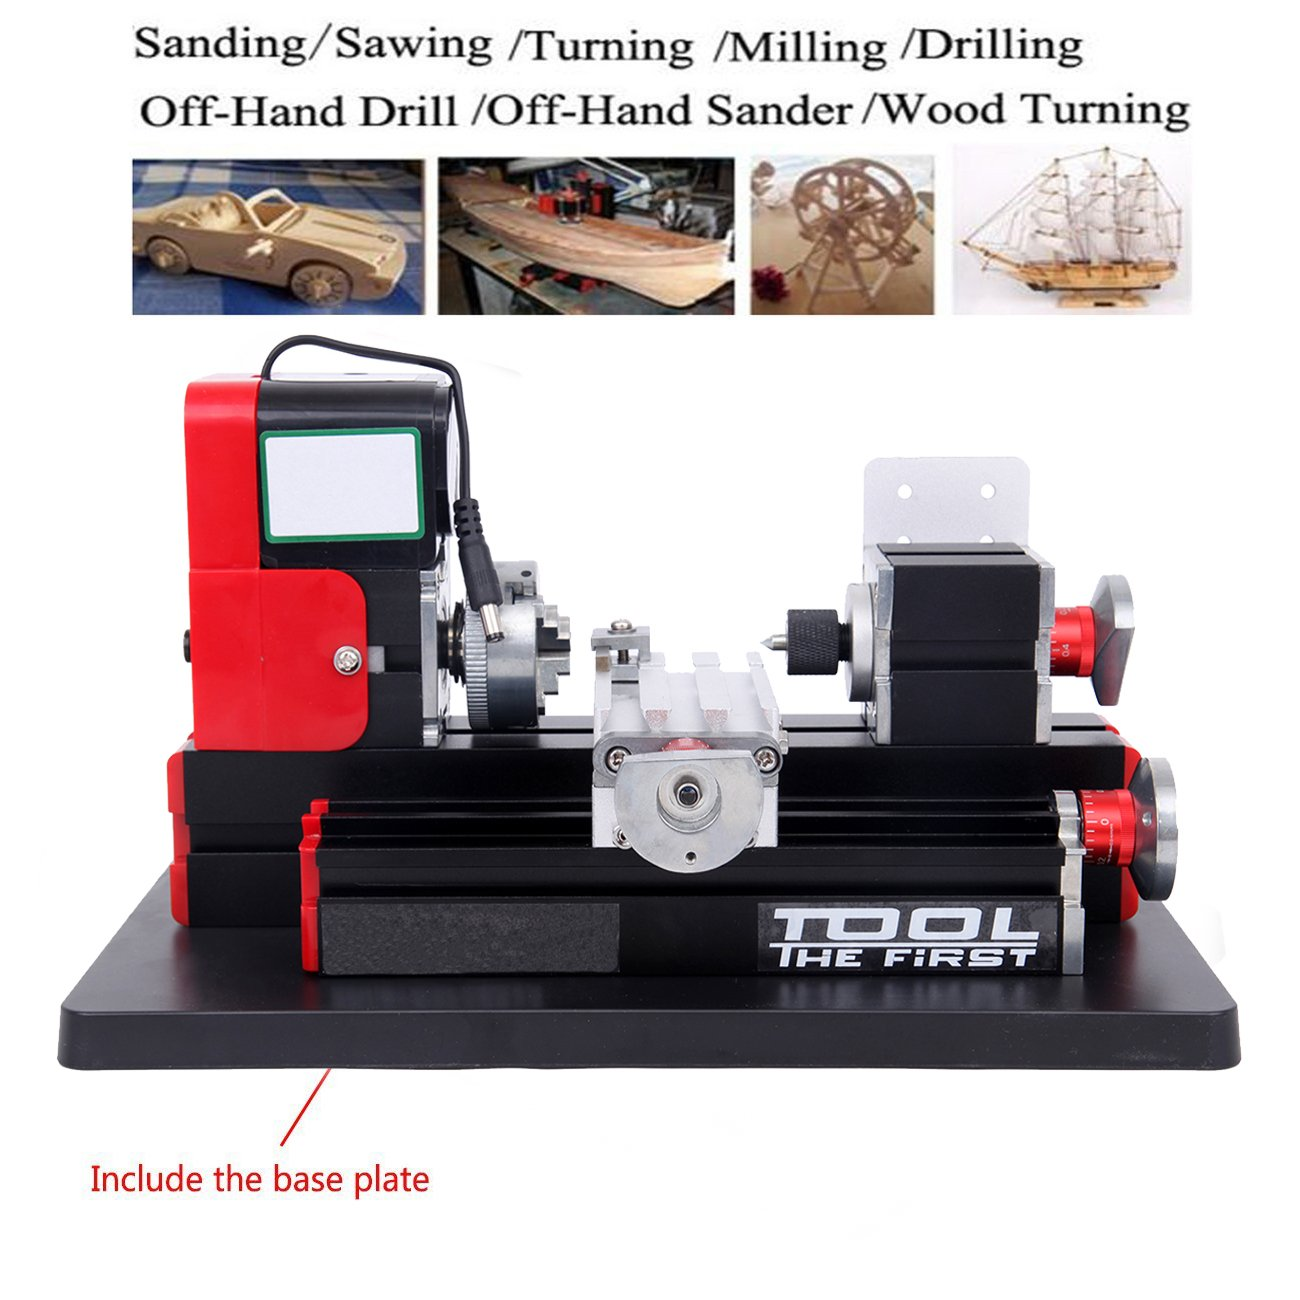 Ridgeyard 24W 20000rpm Mini Motorized Metal Working Lathe Machine DIY Woodworking Tool for Hobby Science Education Modelmaking